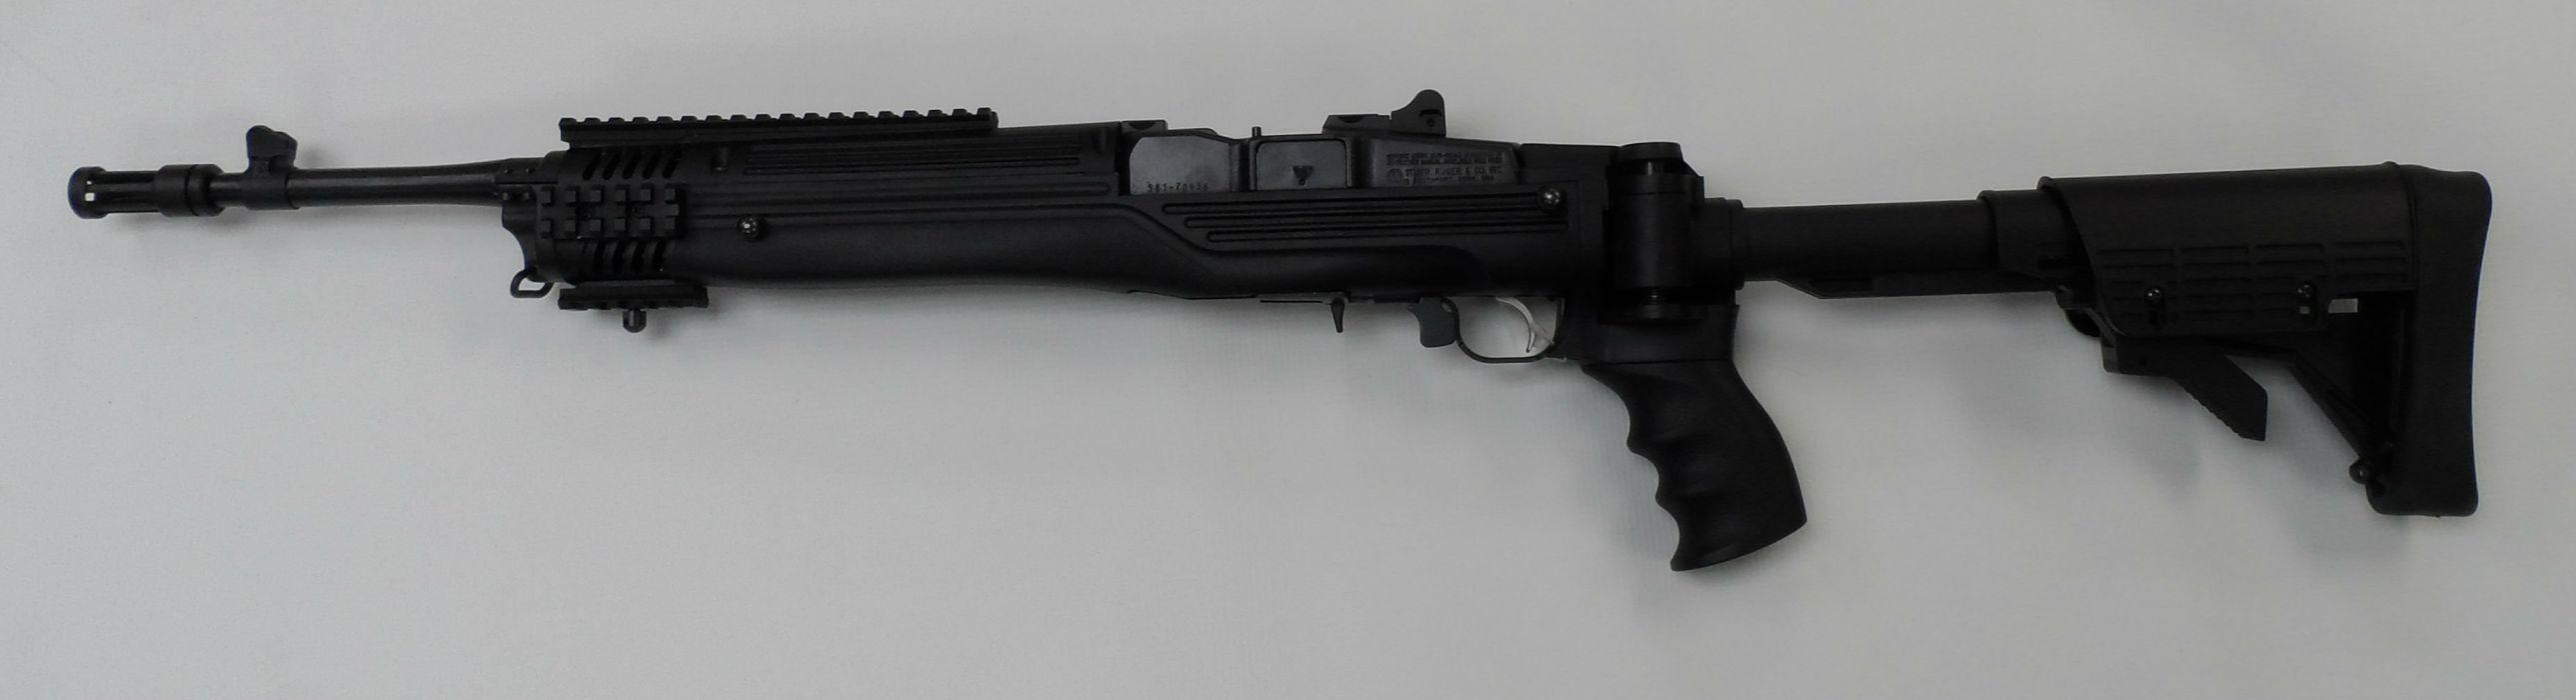 MINI-14 assault rifle weapon gun military mini (15) wallpaper